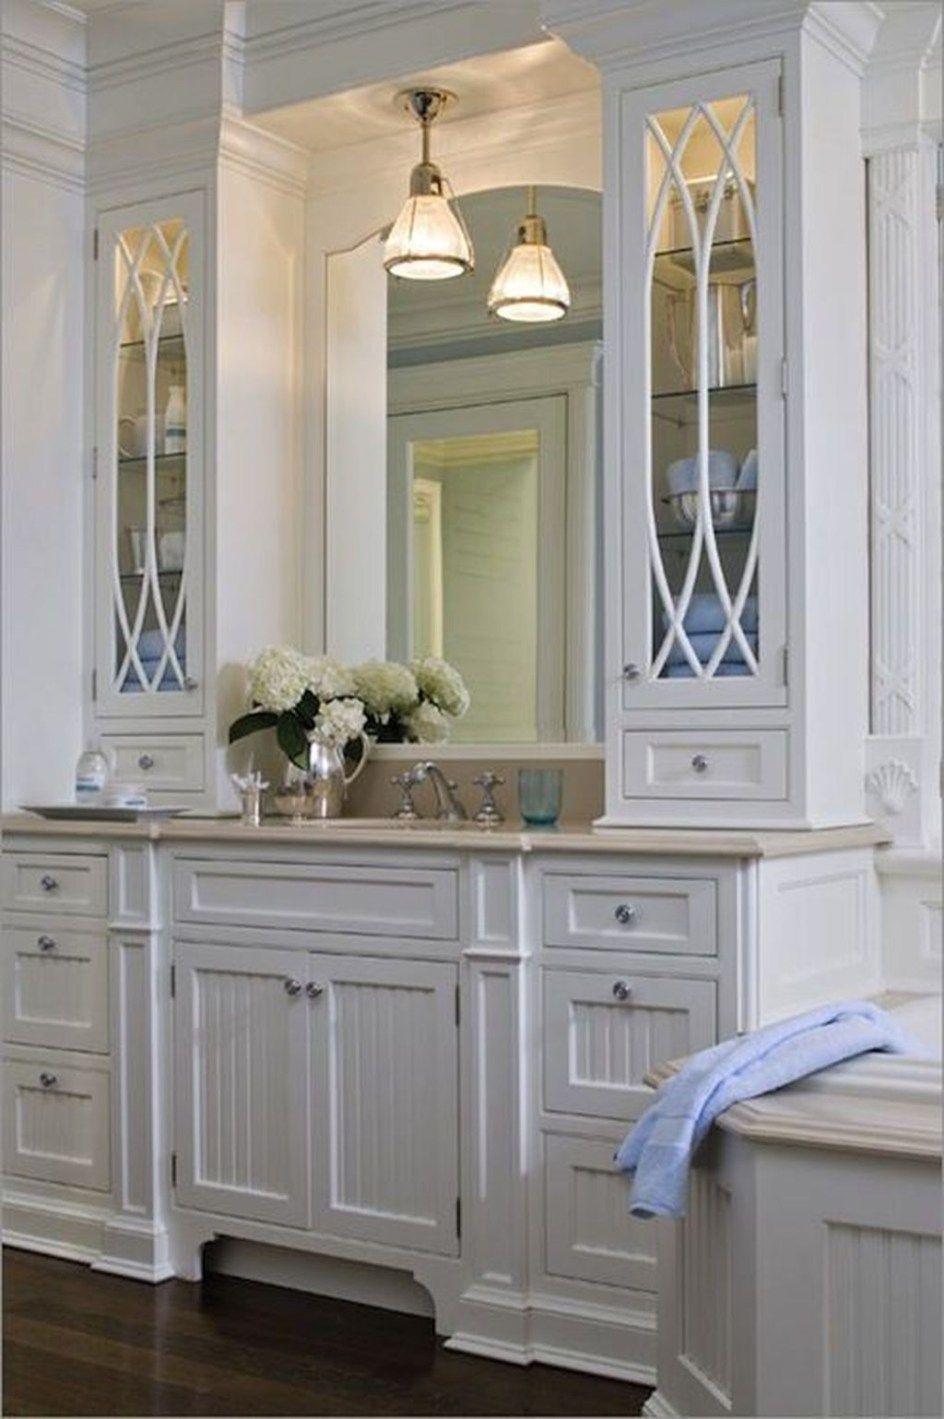 Popular Bathroom Cabinets Ideas 24 | Cheap bathroom ...